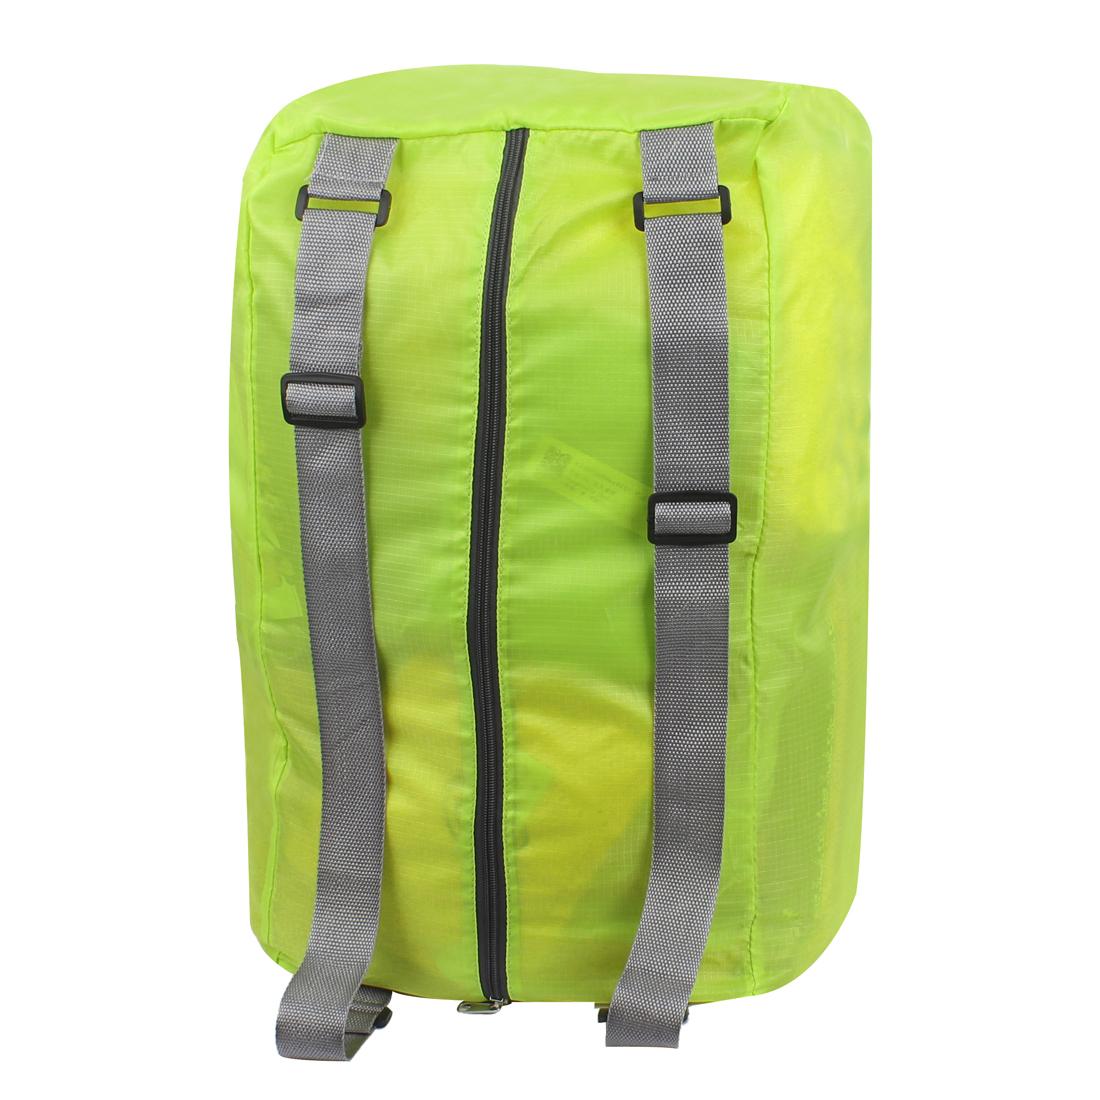 Green Water Resistant Folding Camping Hiking Bag Shoulder Cross Storage Handbag Backpack